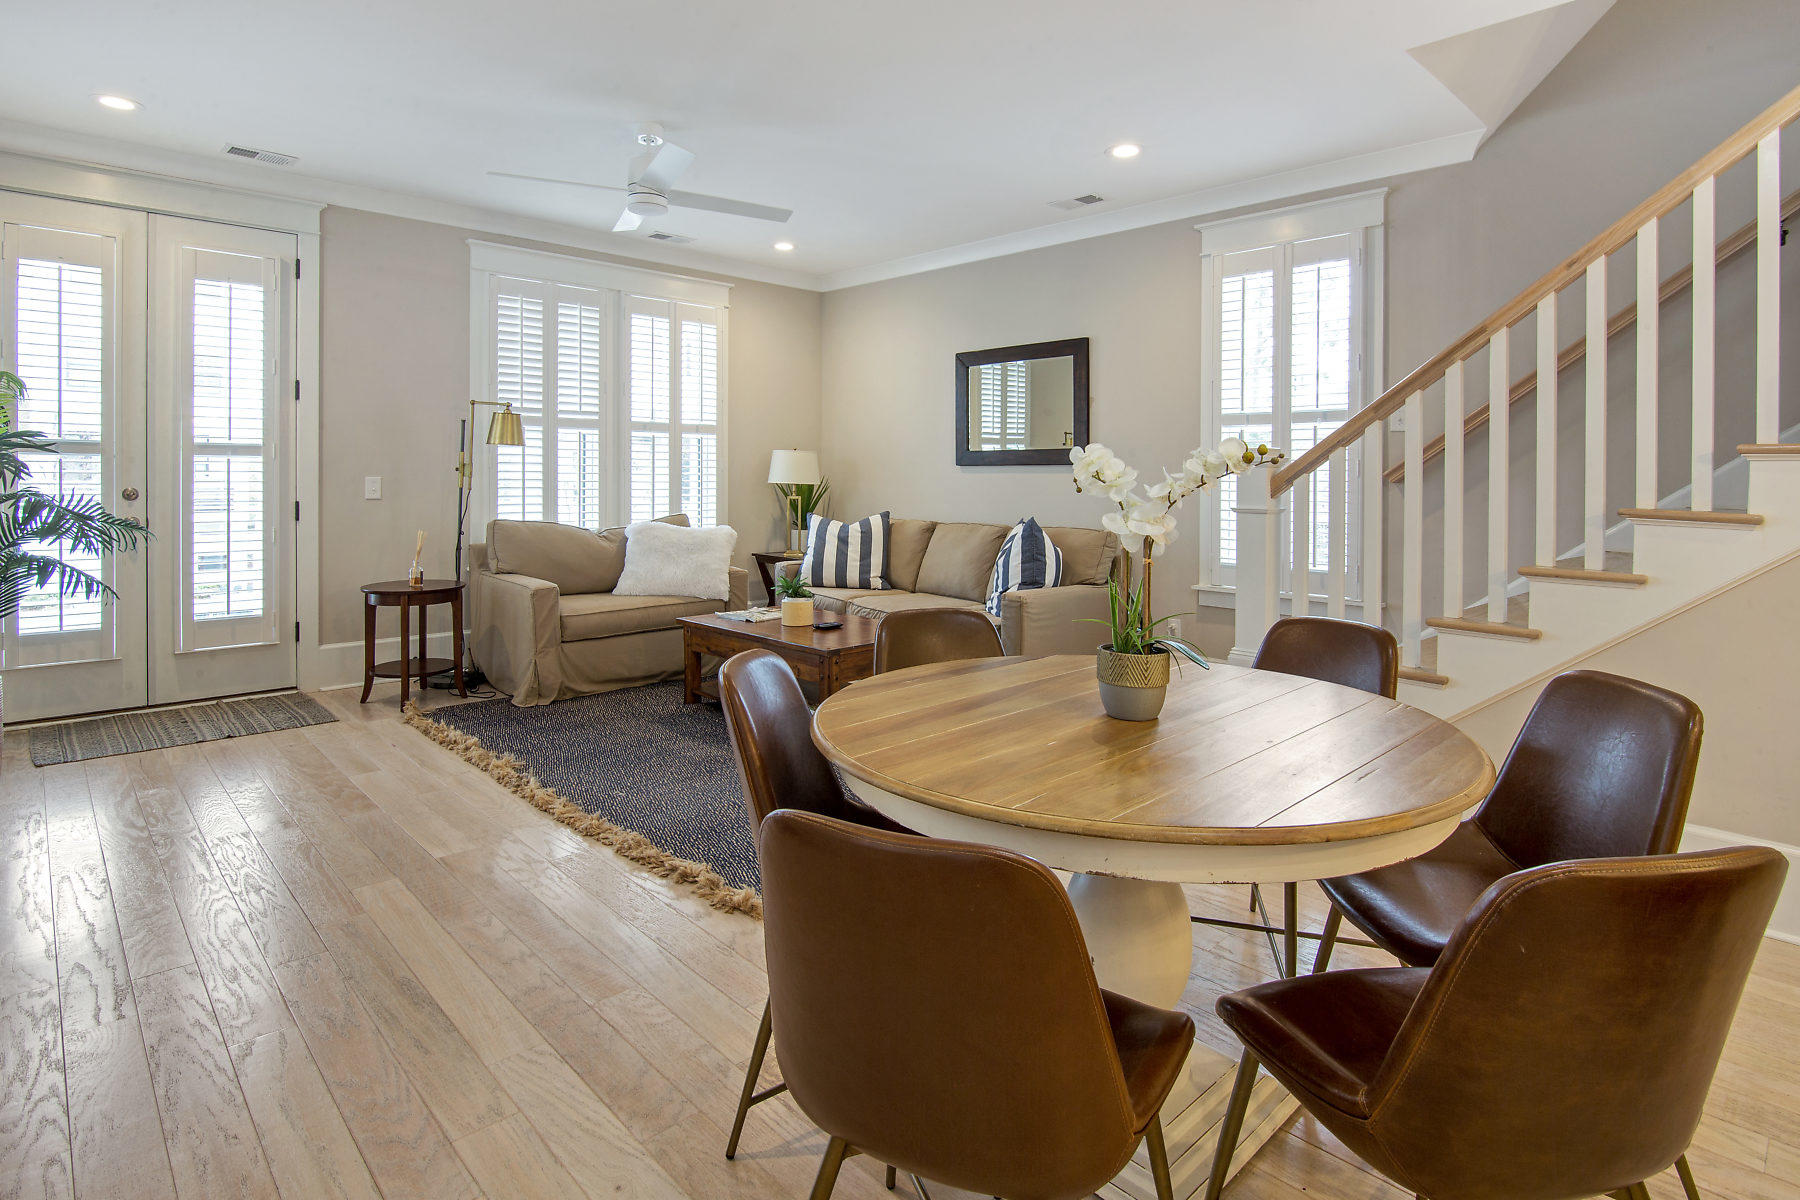 Sullivans Pointe Homes For Sale - 964 Key Colony, Mount Pleasant, SC - 10